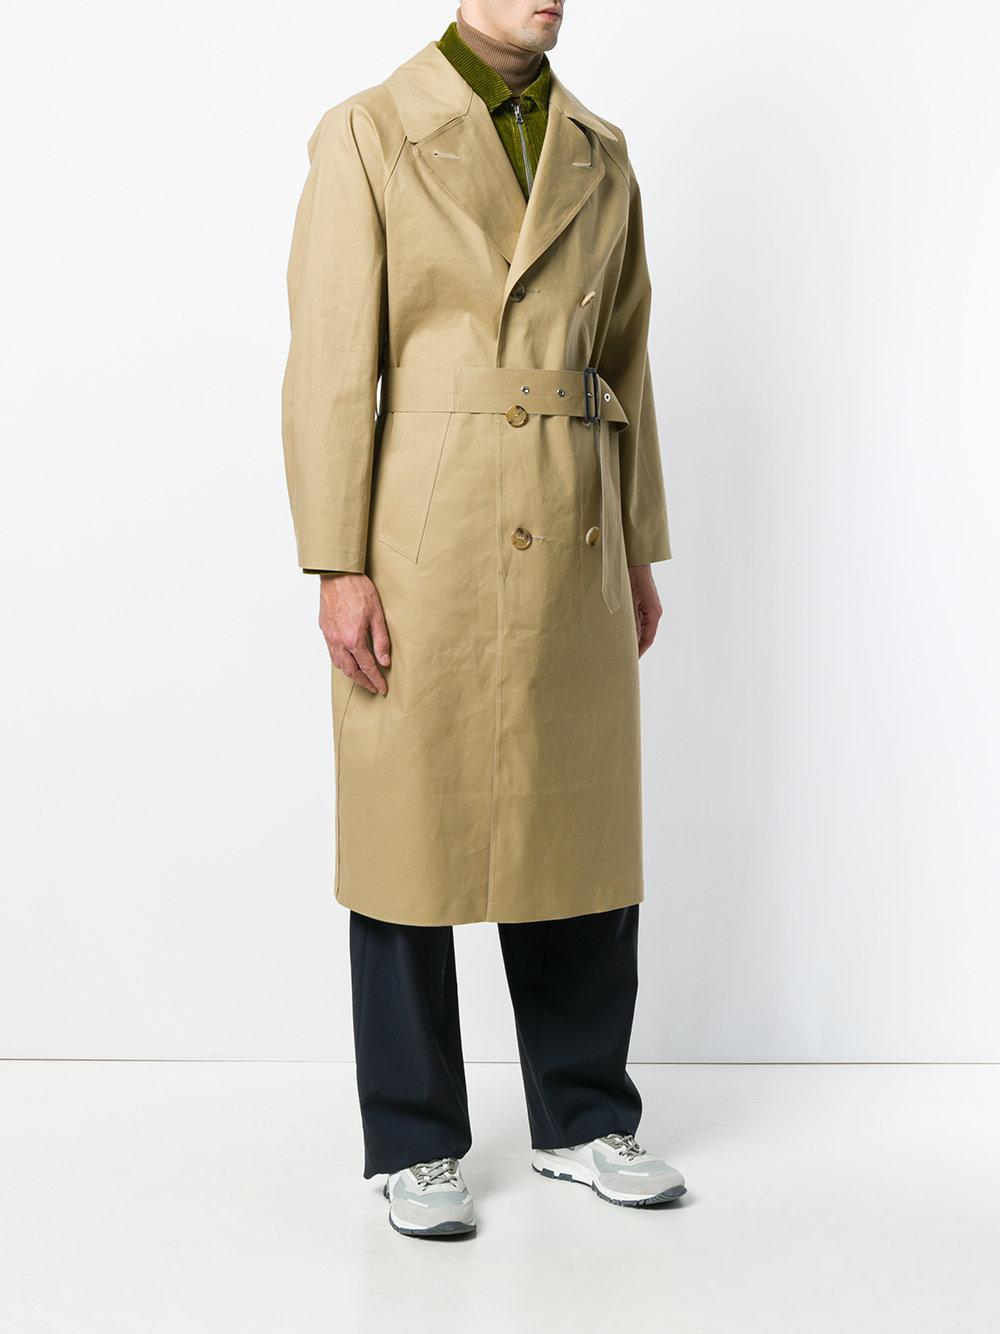 Mackintosh Kelp Trench Coat in Natural for Men - Lyst